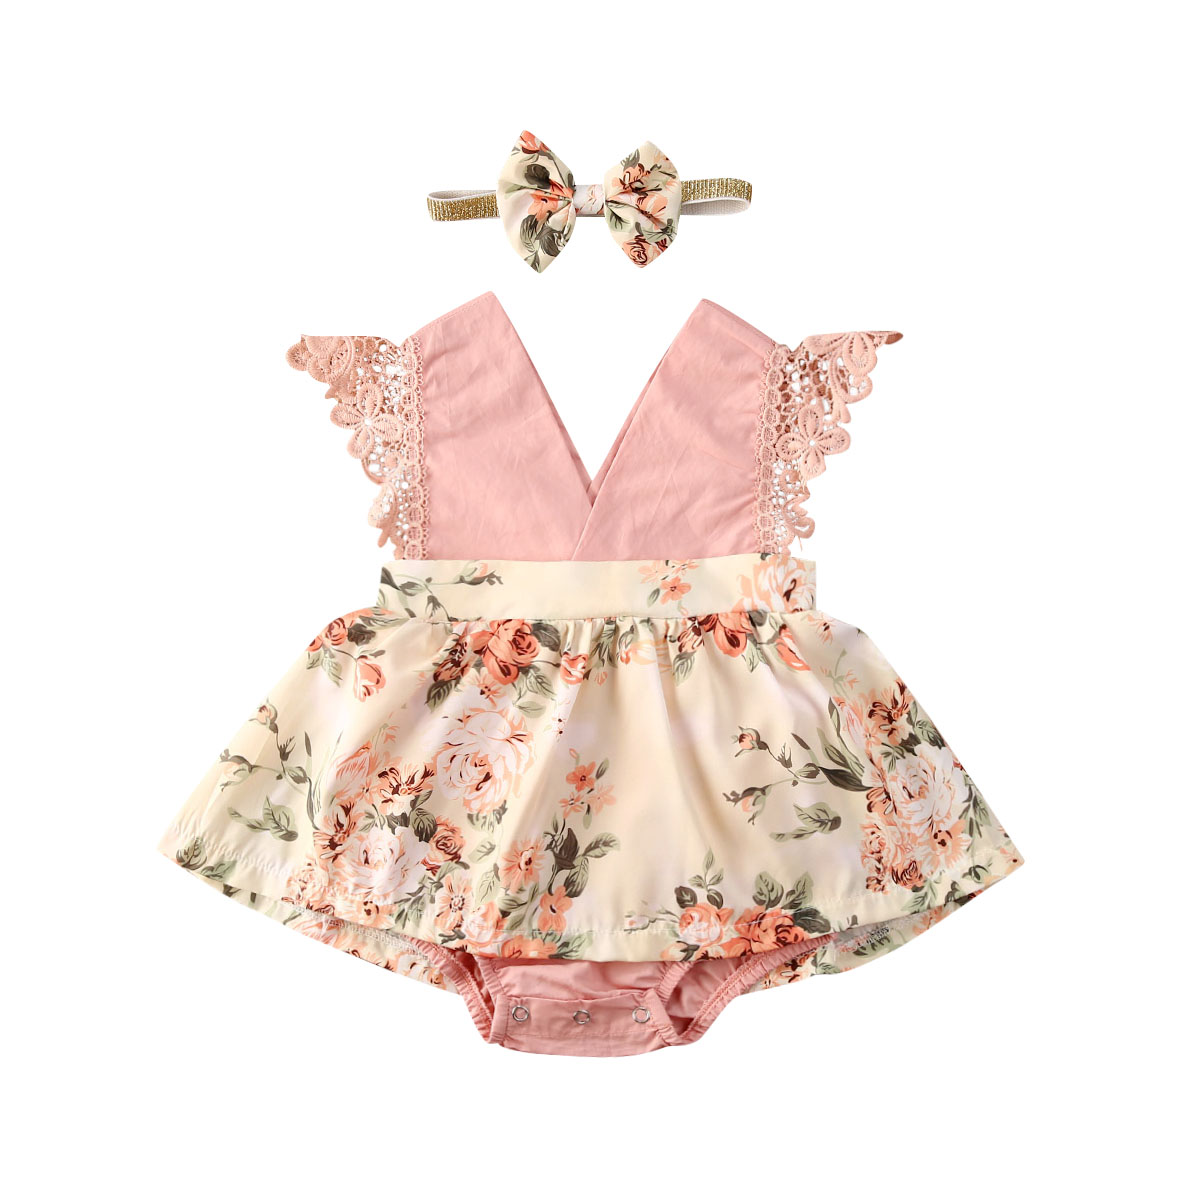 2020 Newborn Baby Girls Bodysuit Sleeveless V Neck Princess Jumpsuits Headband 2Pcs Infant Floral Clothes